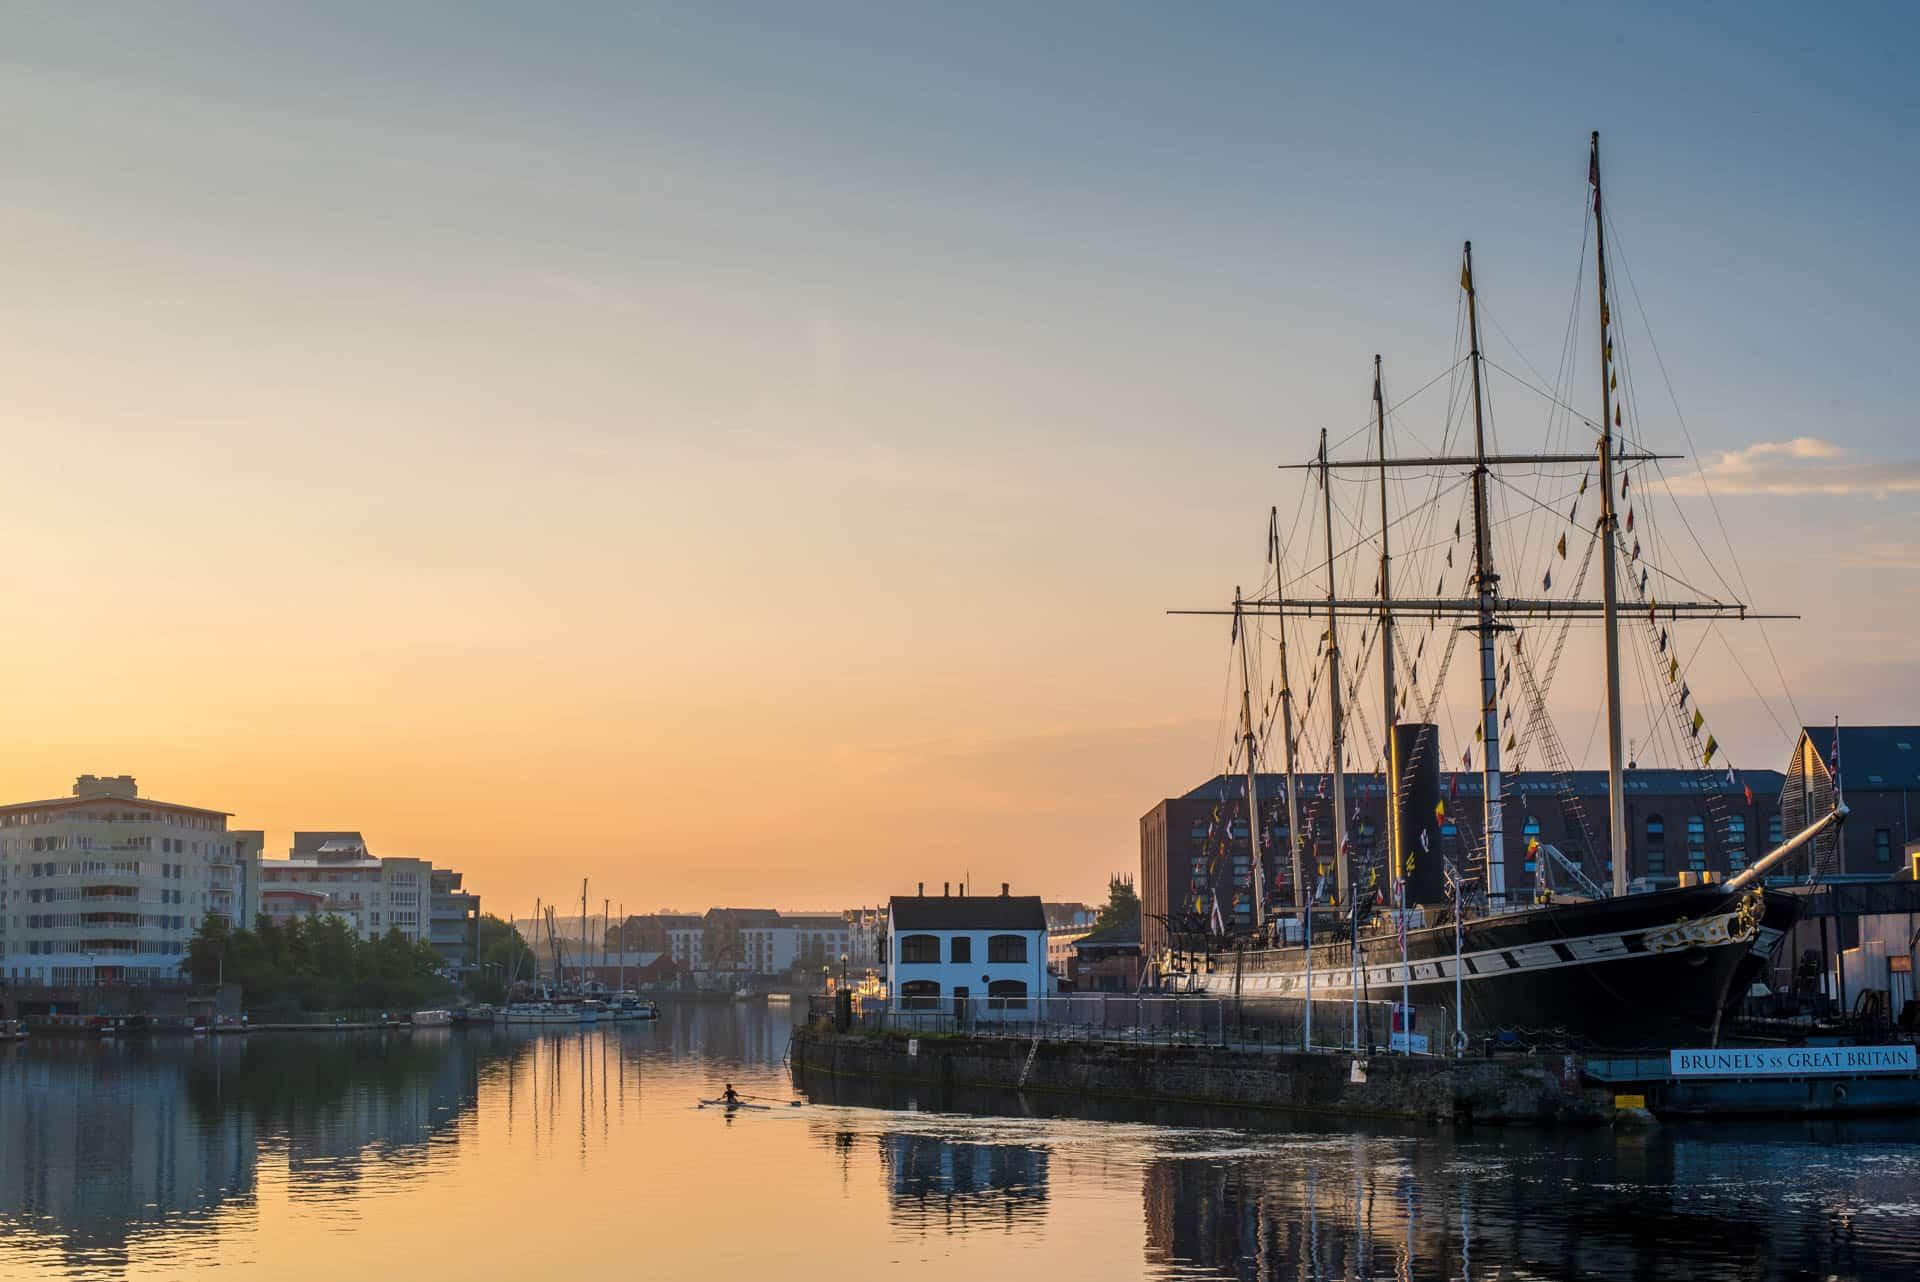 SS Great Britain in Bristol Docks